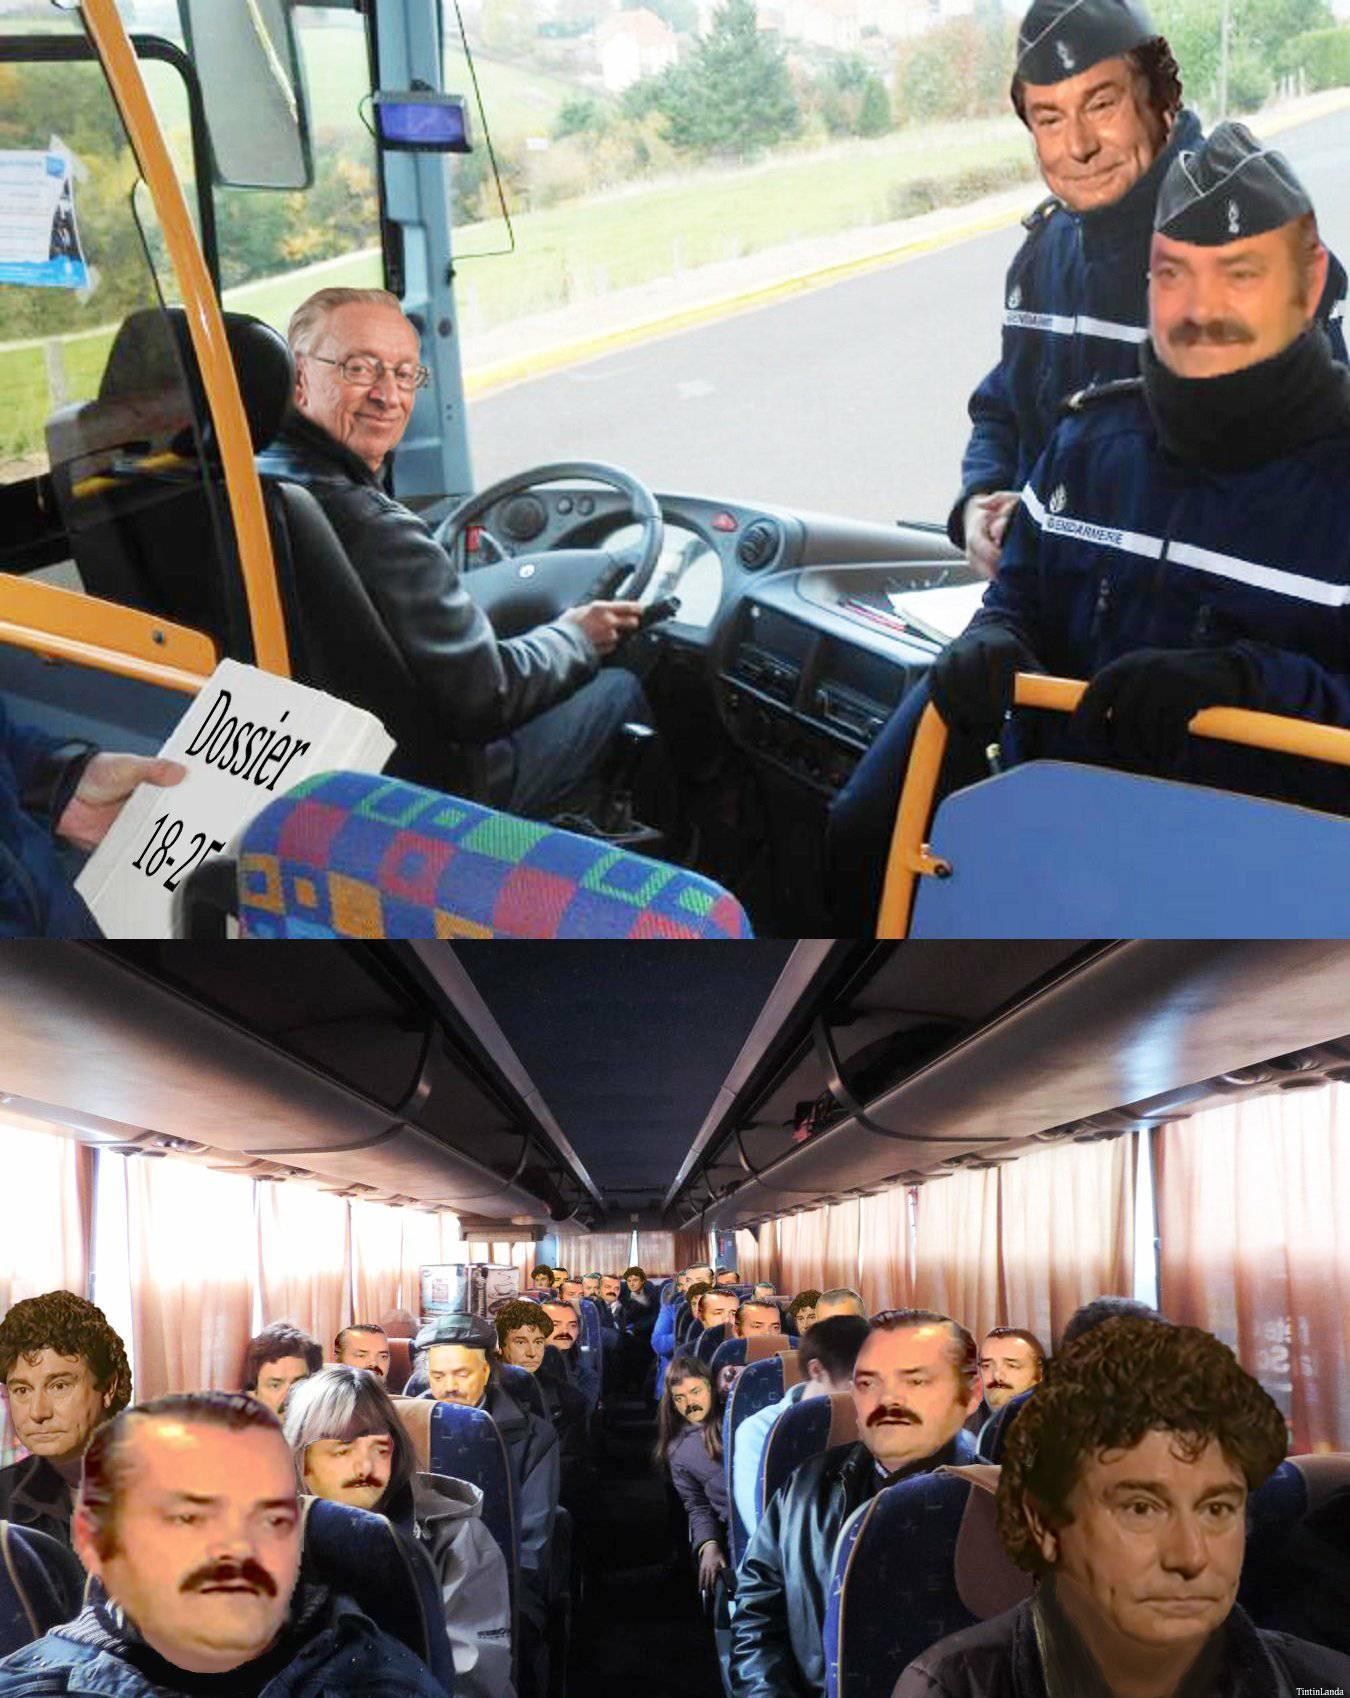 Sticker gilbert risitas bus carabistouilles irl lesquen henry la chance